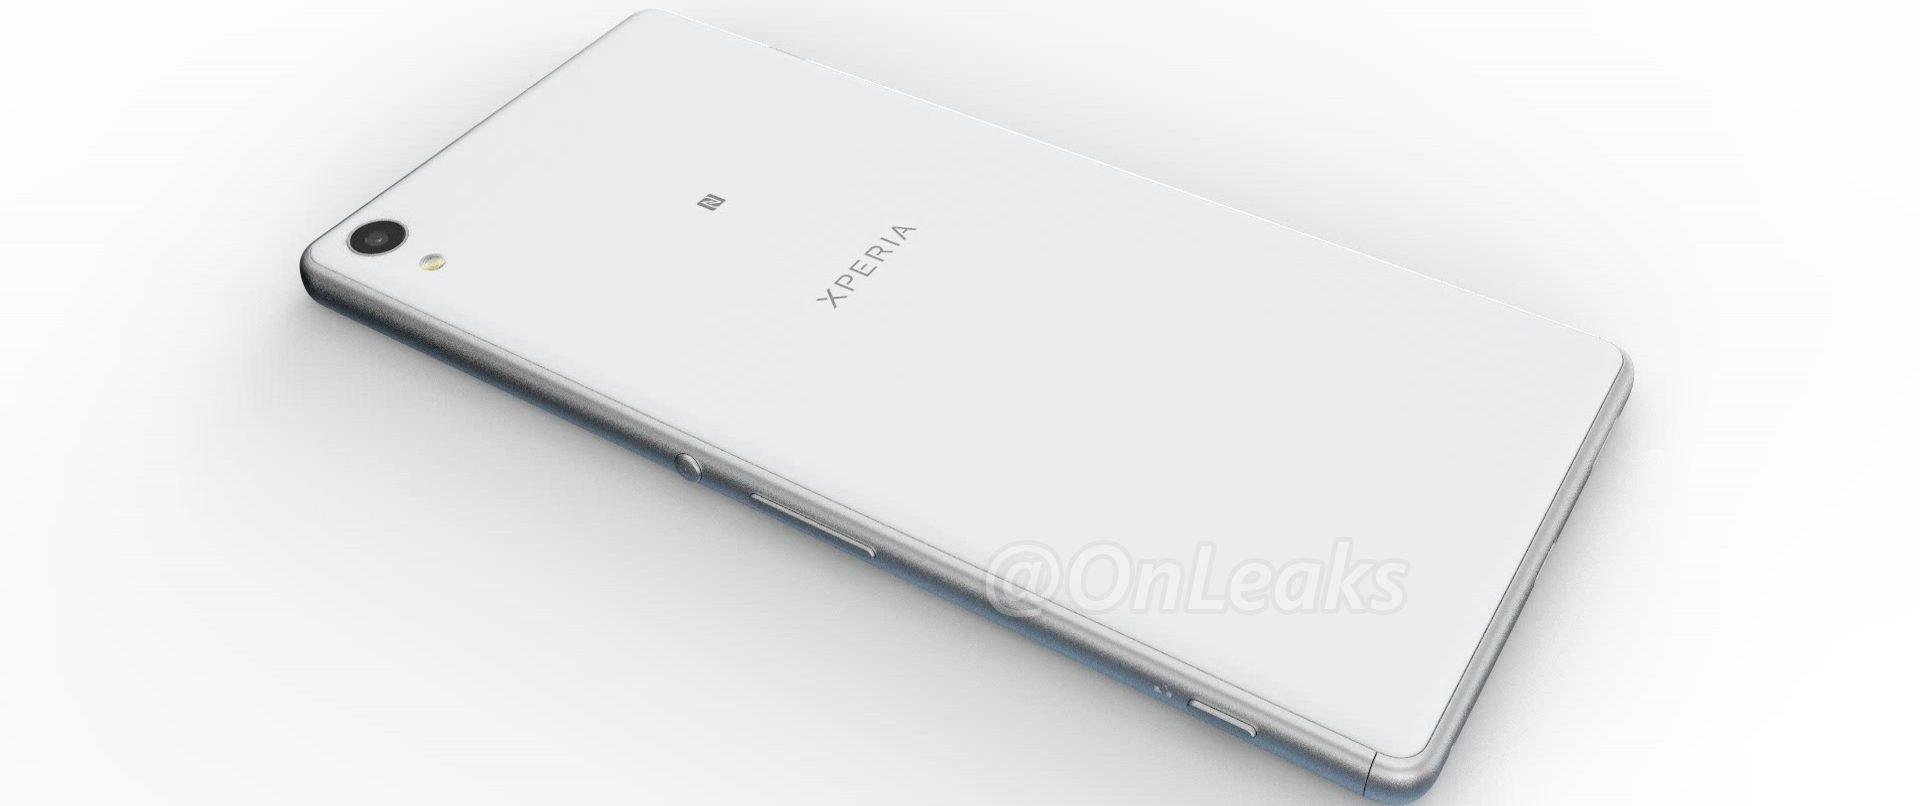 Sony Xperia C6 Ultra Pics